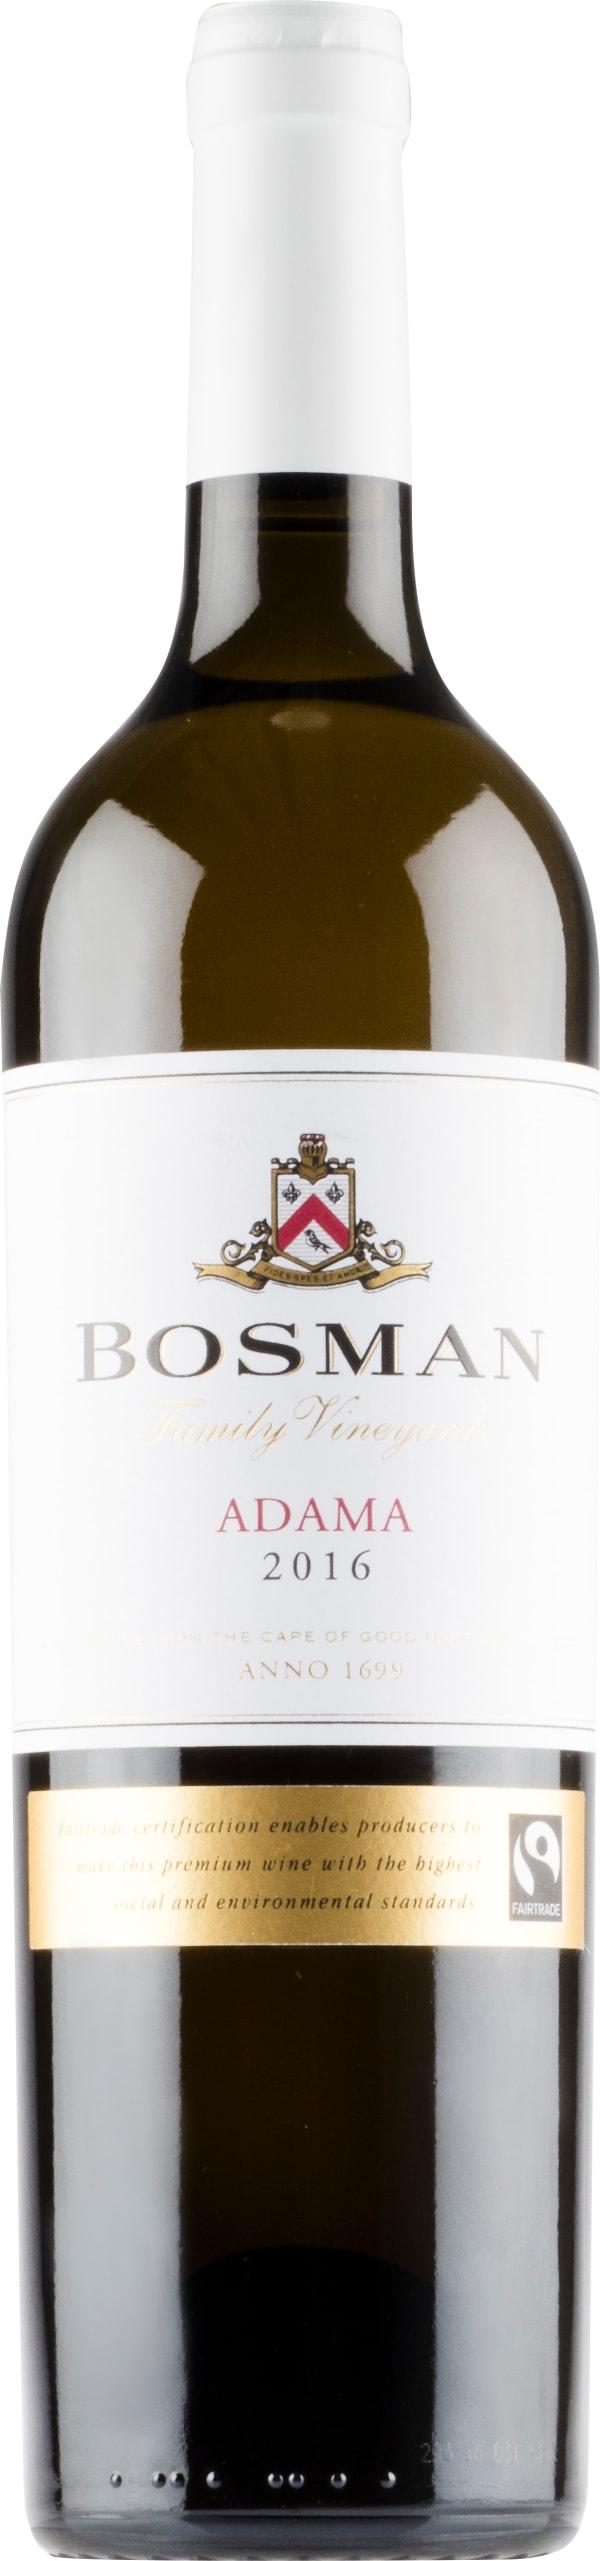 Bosman Adama 2016